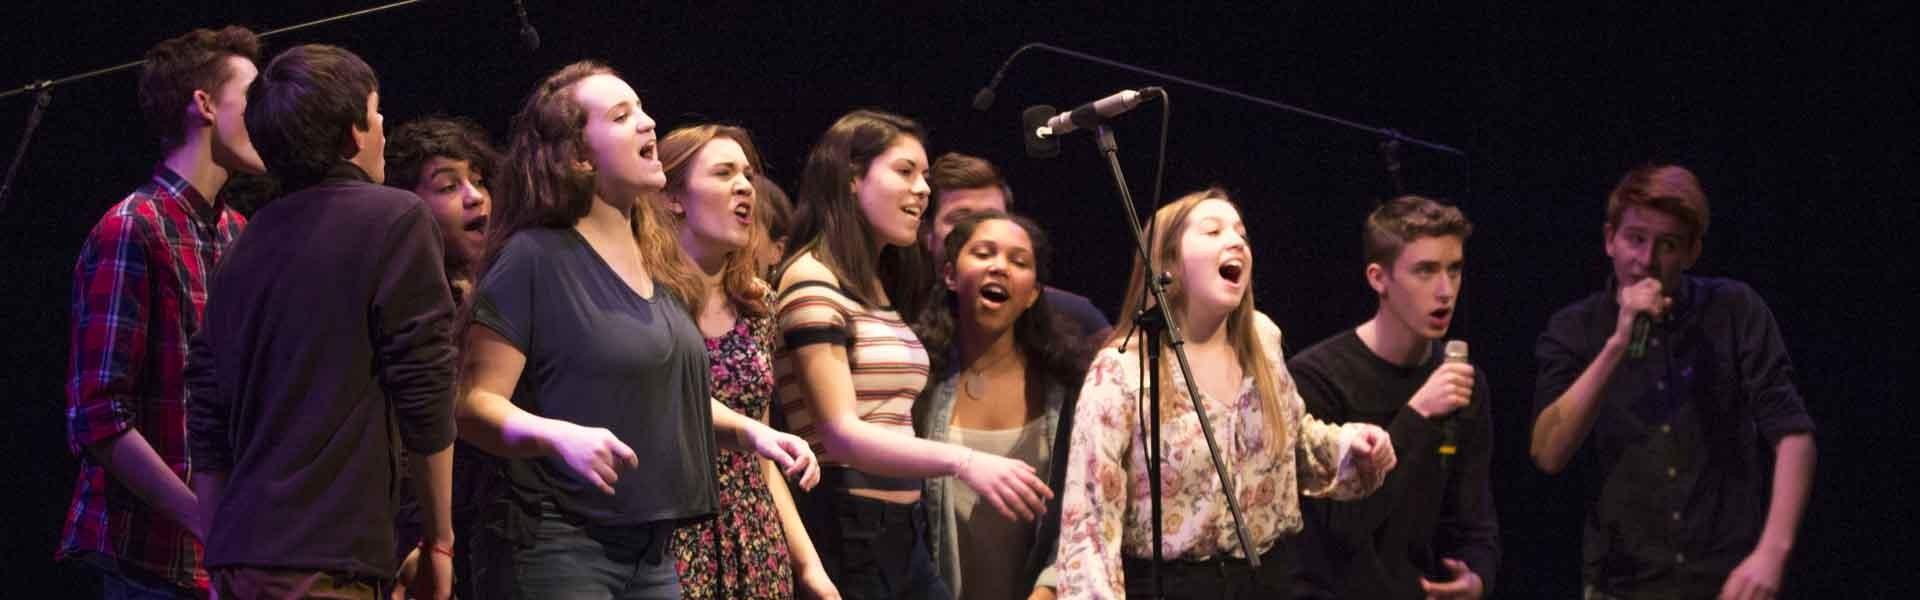 Northampton High School Massachusetts USA Theater Banner 2019